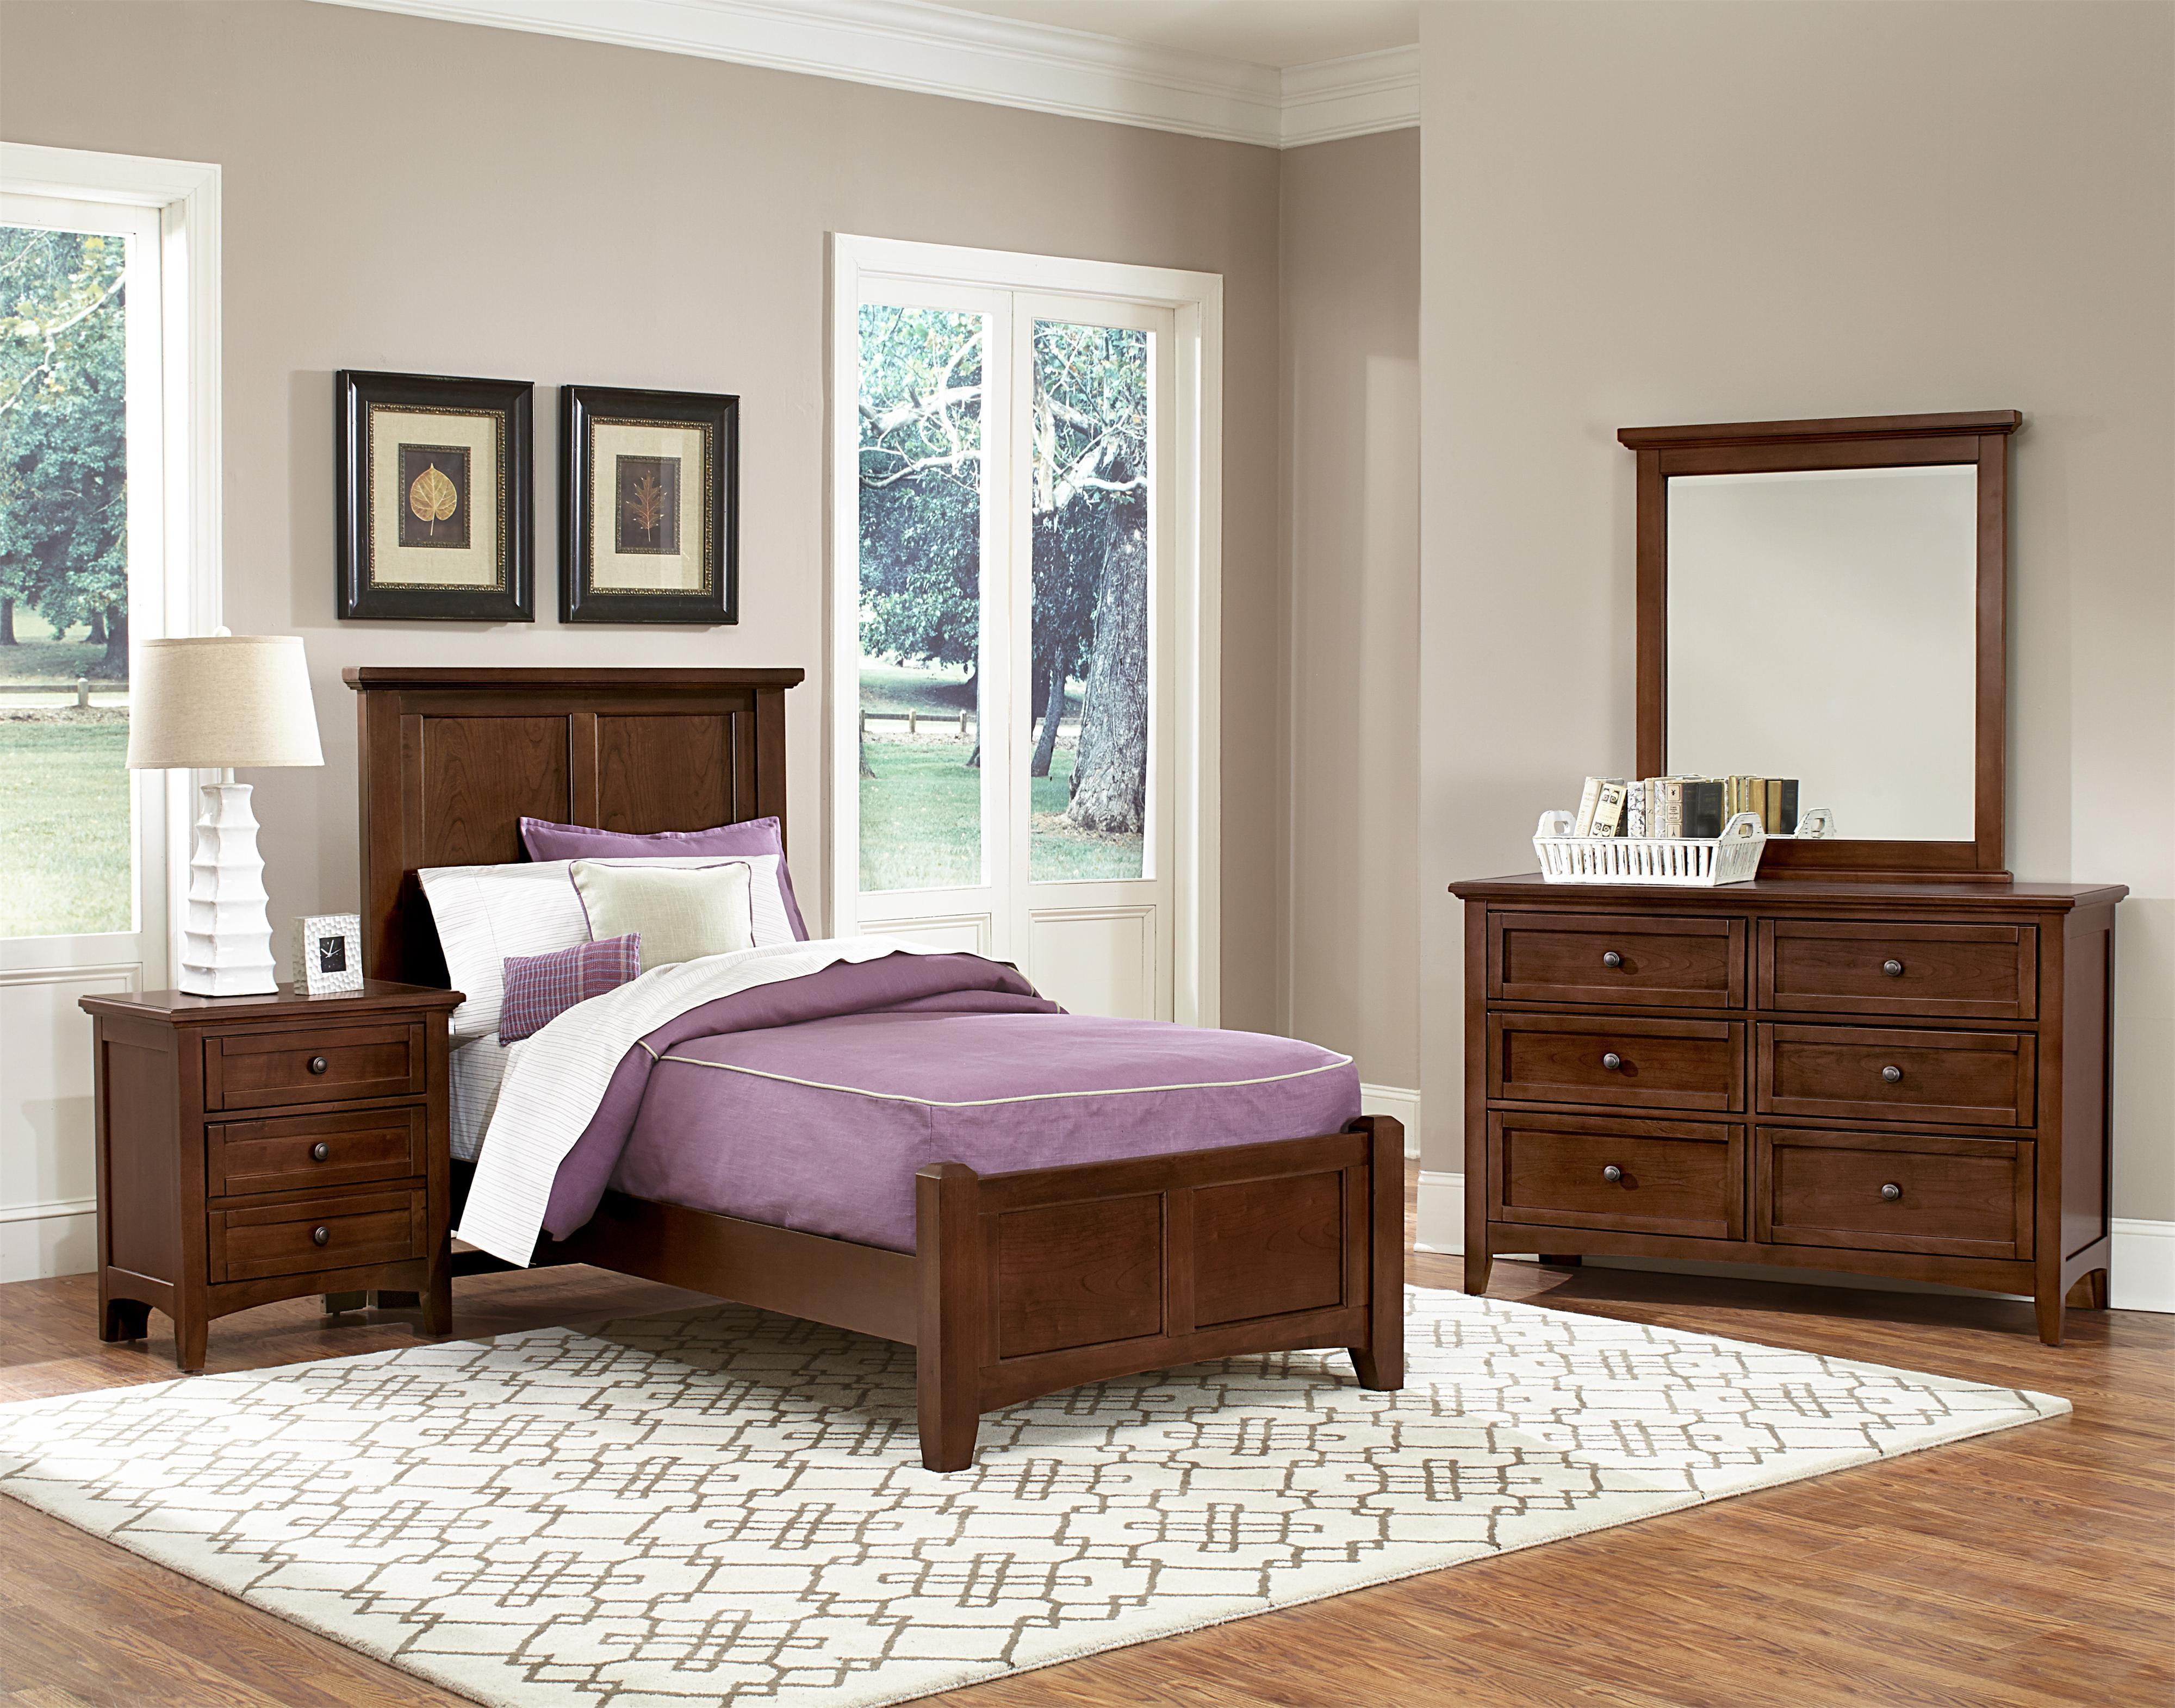 Bonanza Twin Bedroom Group by Vaughan Bassett at Johnny Janosik